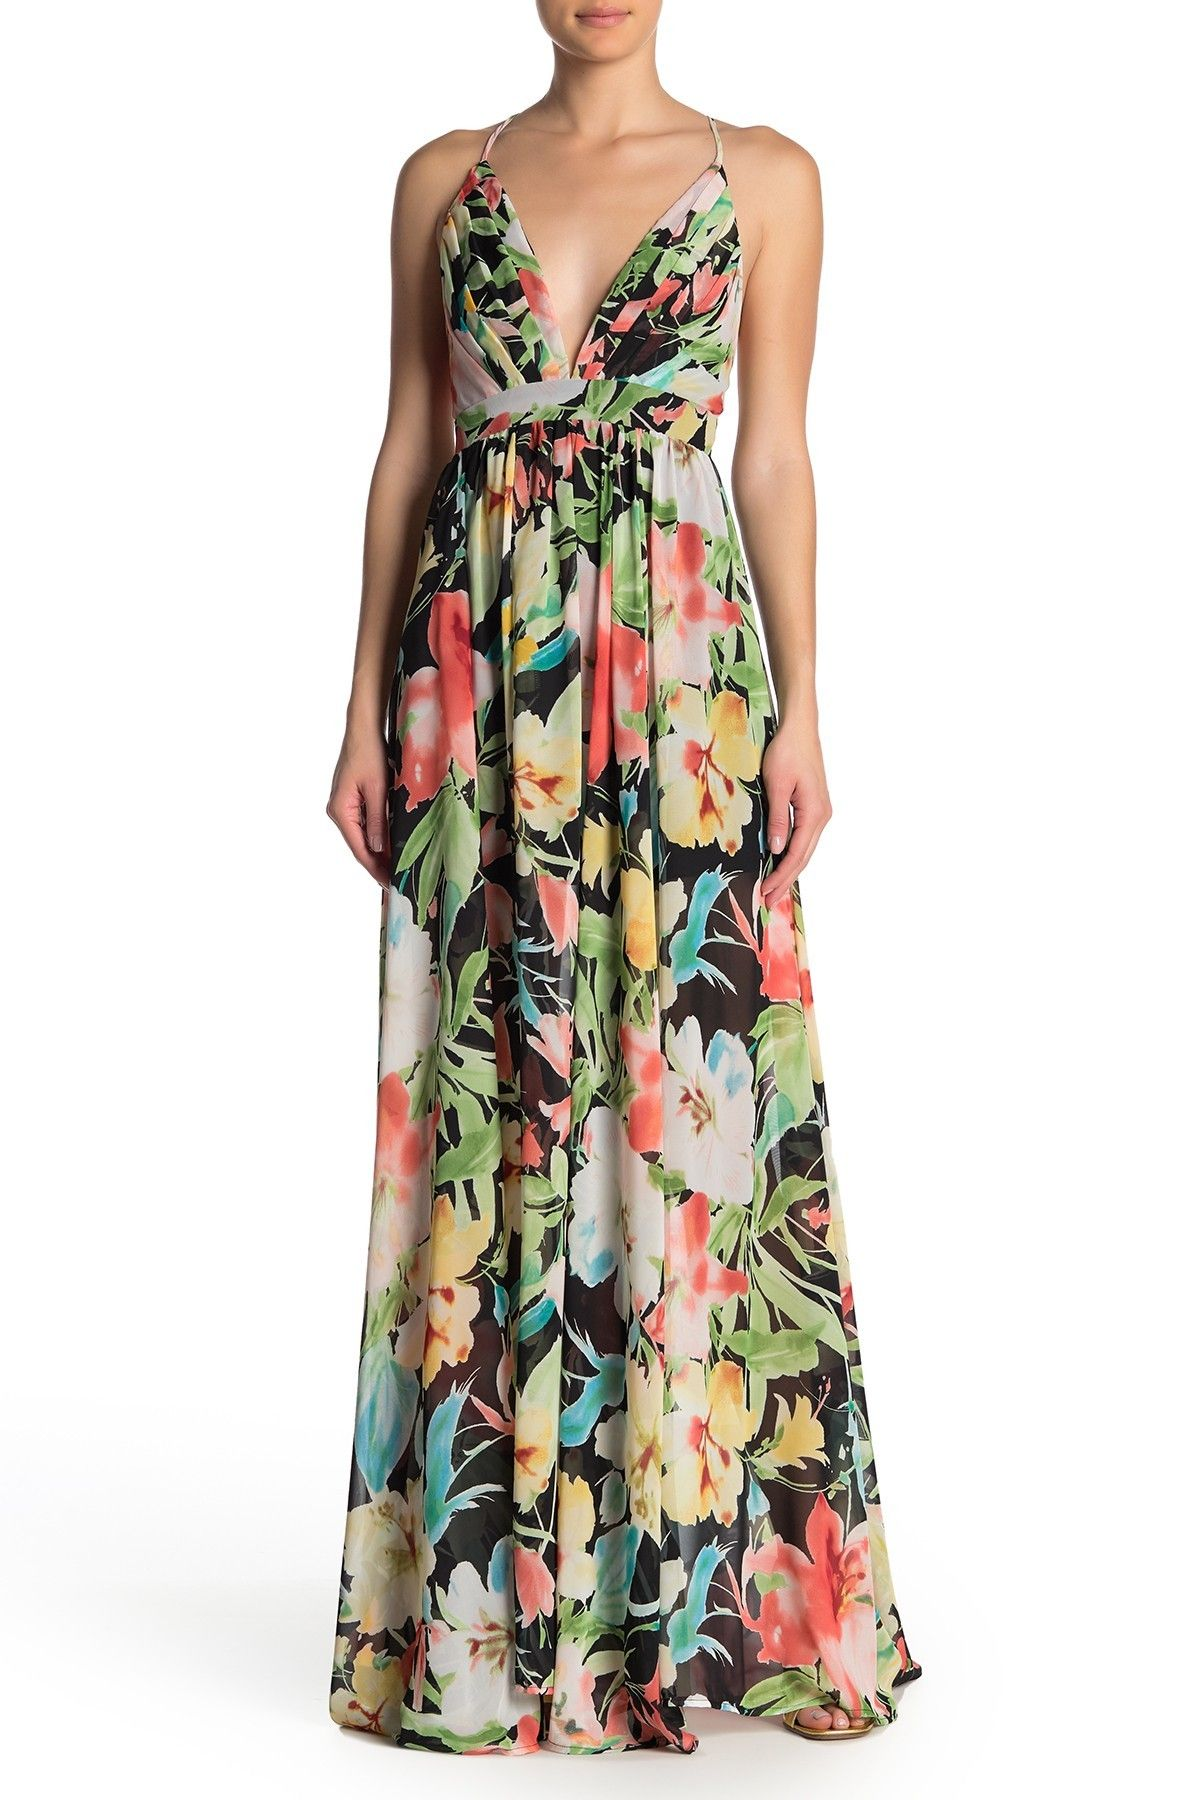 Meghan La Enchanted Garden Floral Print Dress Nordstrom Rack Print Dress Dresses Nordstrom Dresses [ 1800 x 1200 Pixel ]